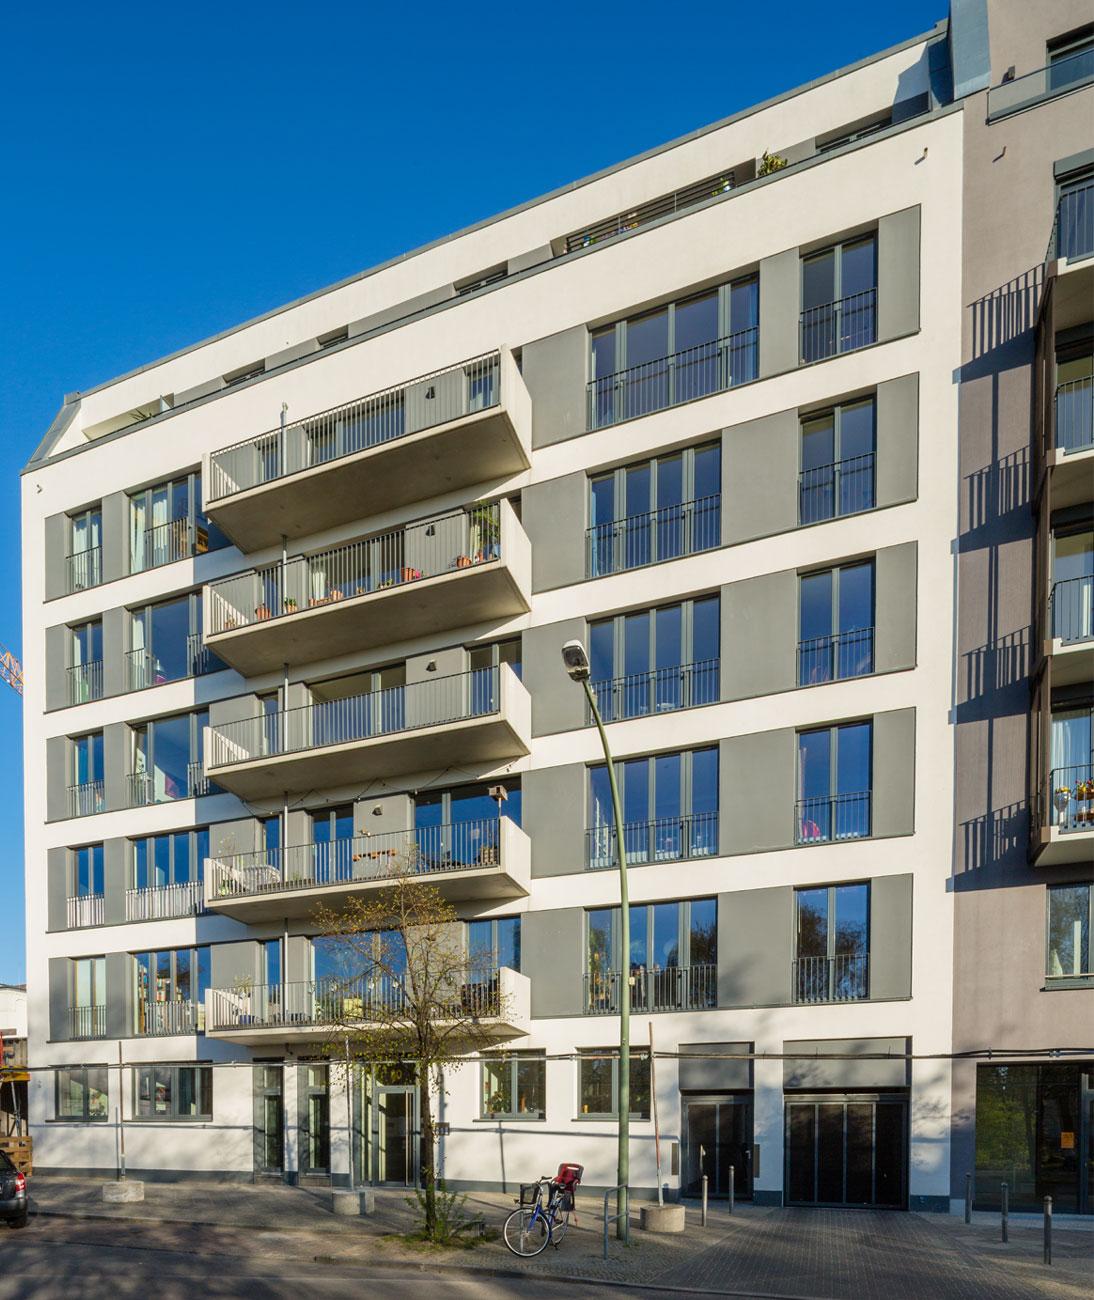 Baugruppenprojekt Boyenstraße 30 - Foto © Zeitort  J. Hohmuth